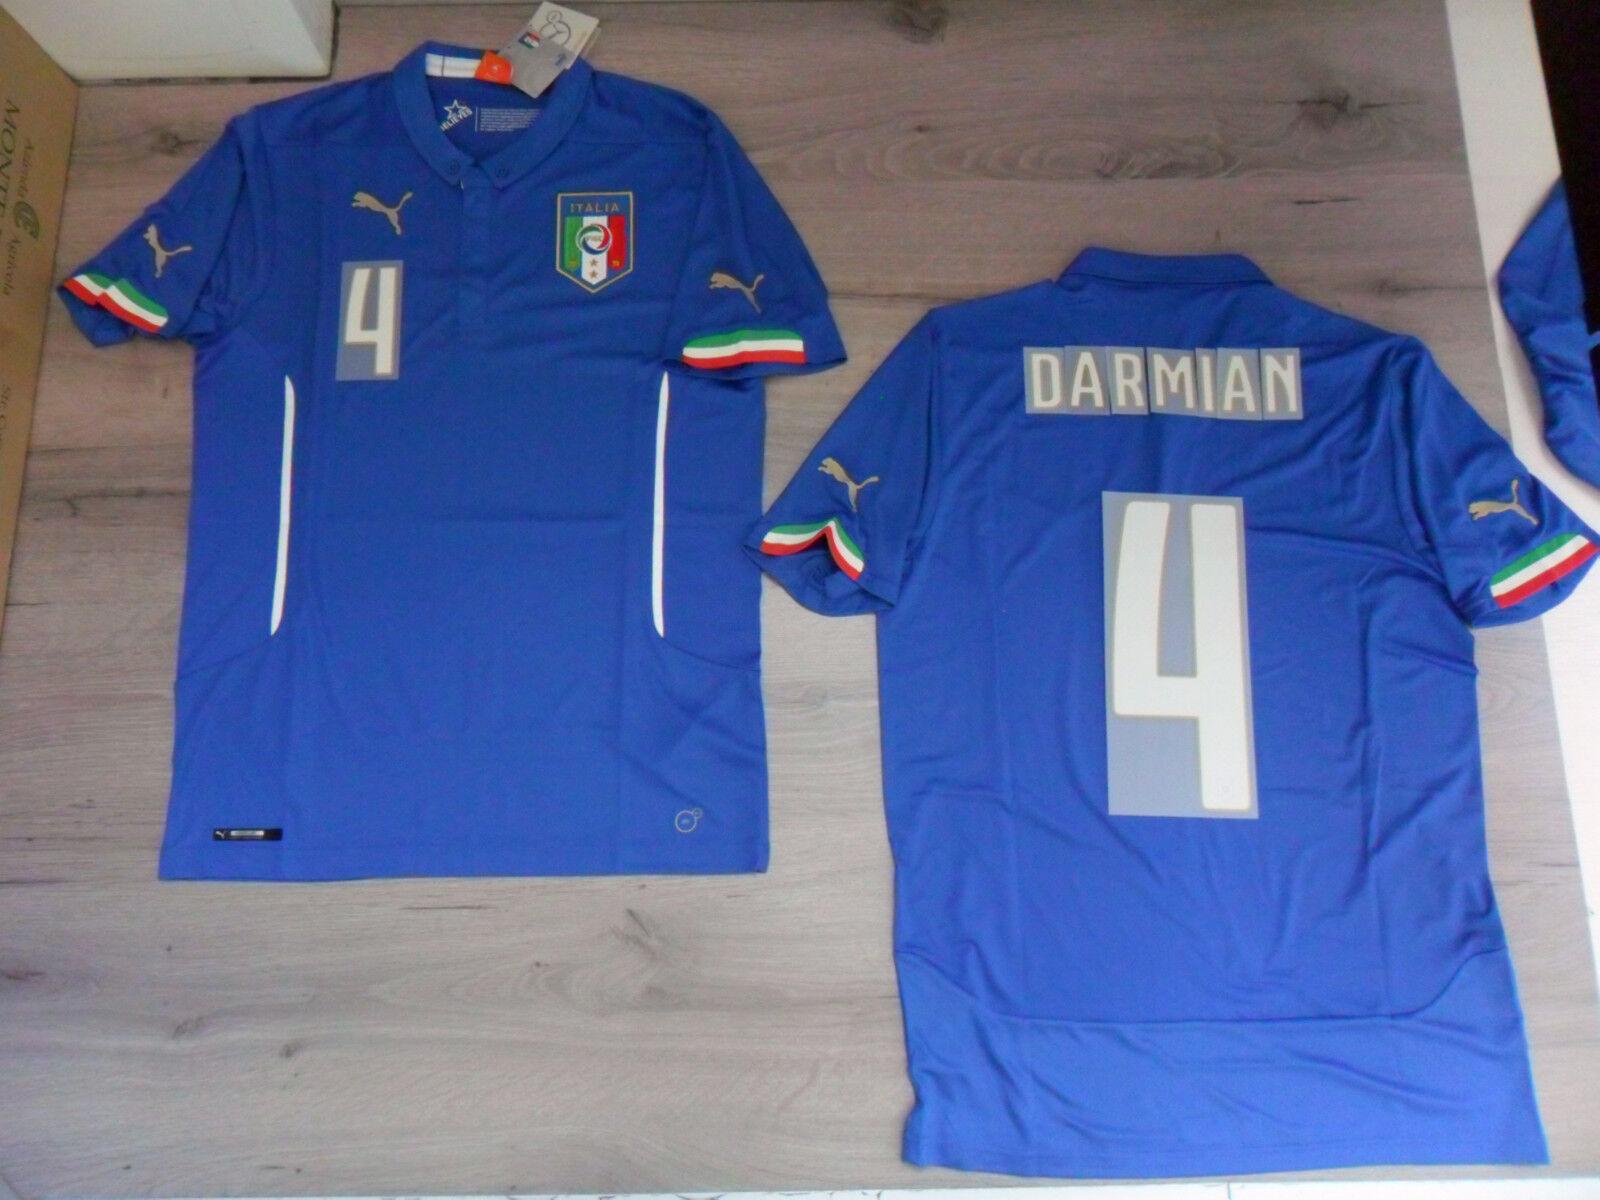 FW14 PUMA M NACH HAUSE ITALIEN 4 4 ITALIEN DARMIAN T-SHIRT WELT TRIKOT JERSEY b7e1b2